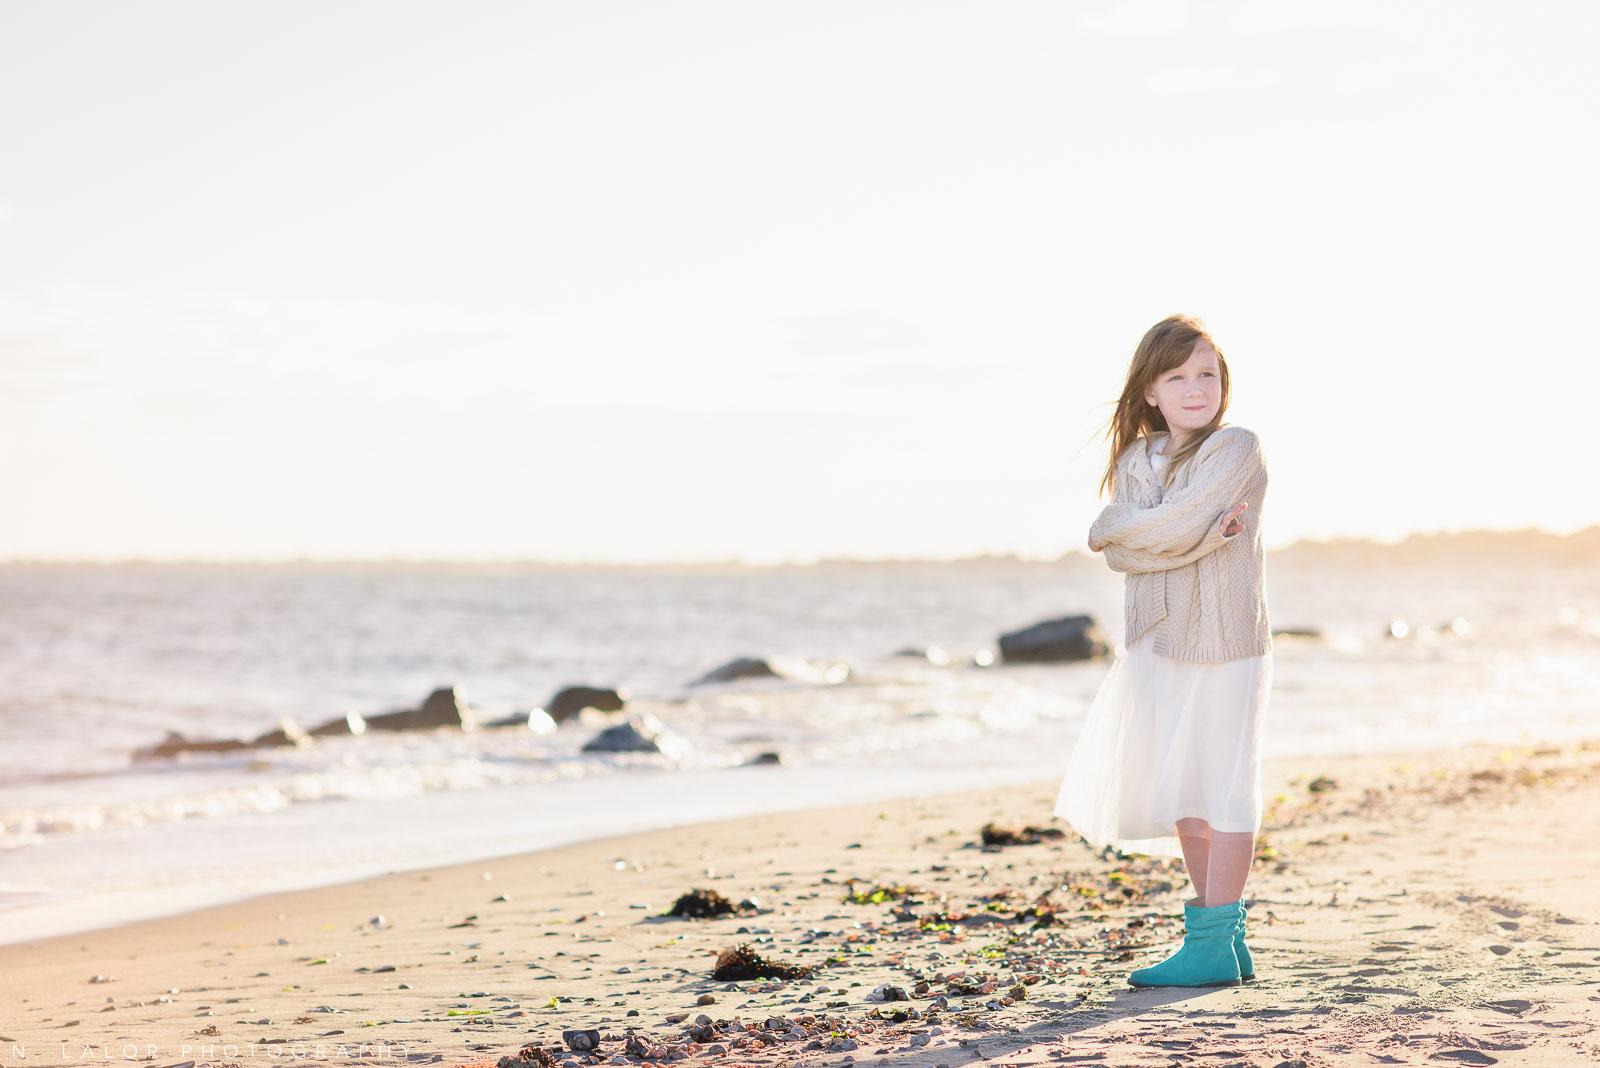 nlalor-photography-2015-10-04-gwen-beach-session-2.jpg